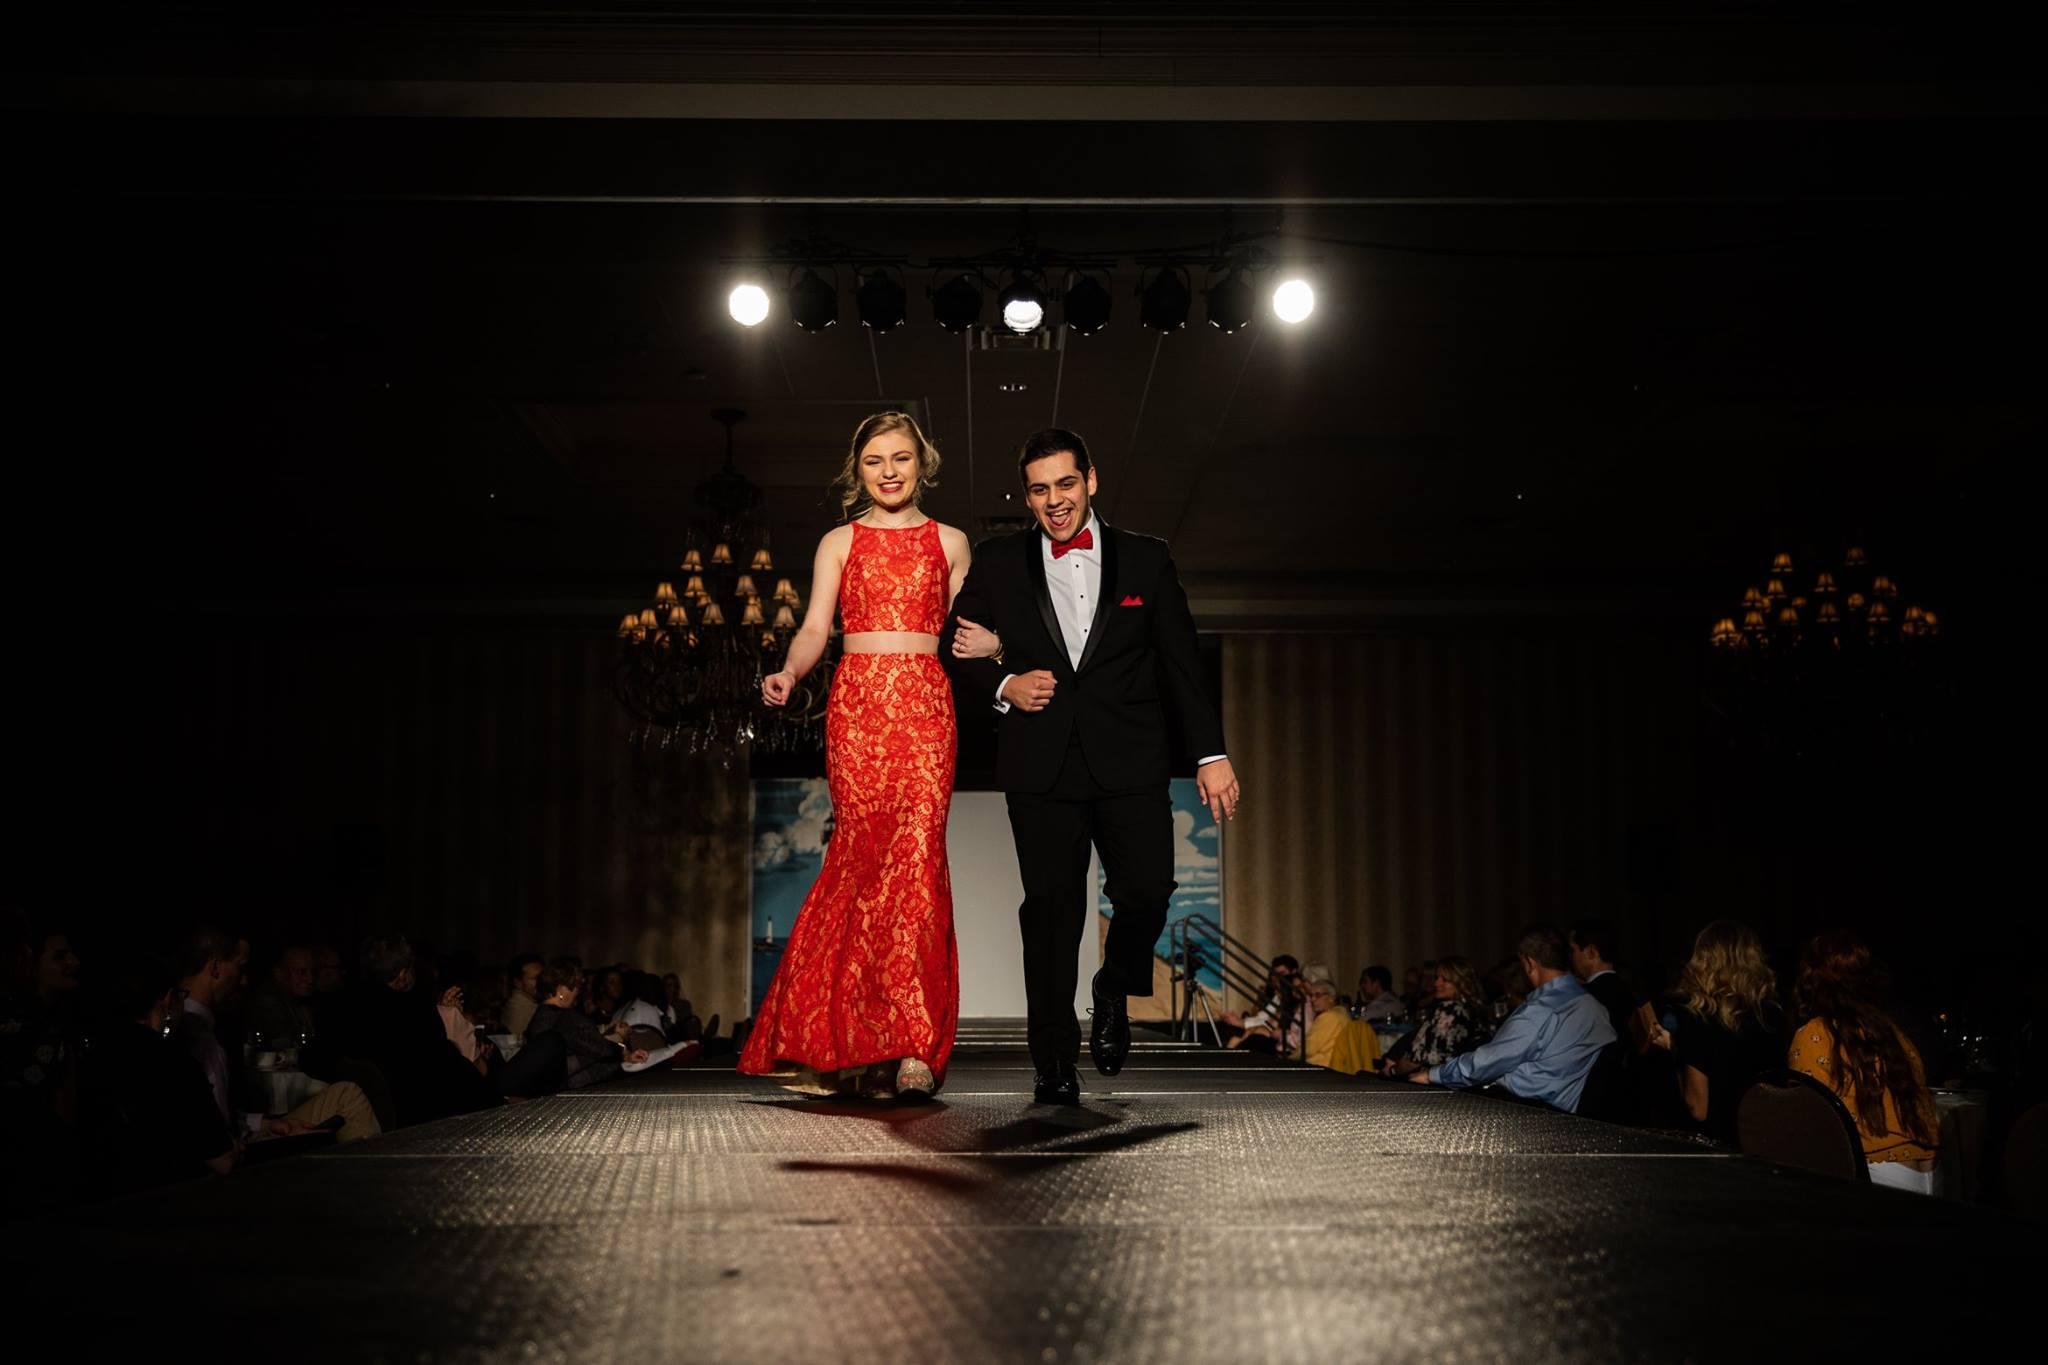 Lutheran_North_High_School_Macomb_Michigan_LHN_Fashion_Show_2019_Seniors (50).jpg